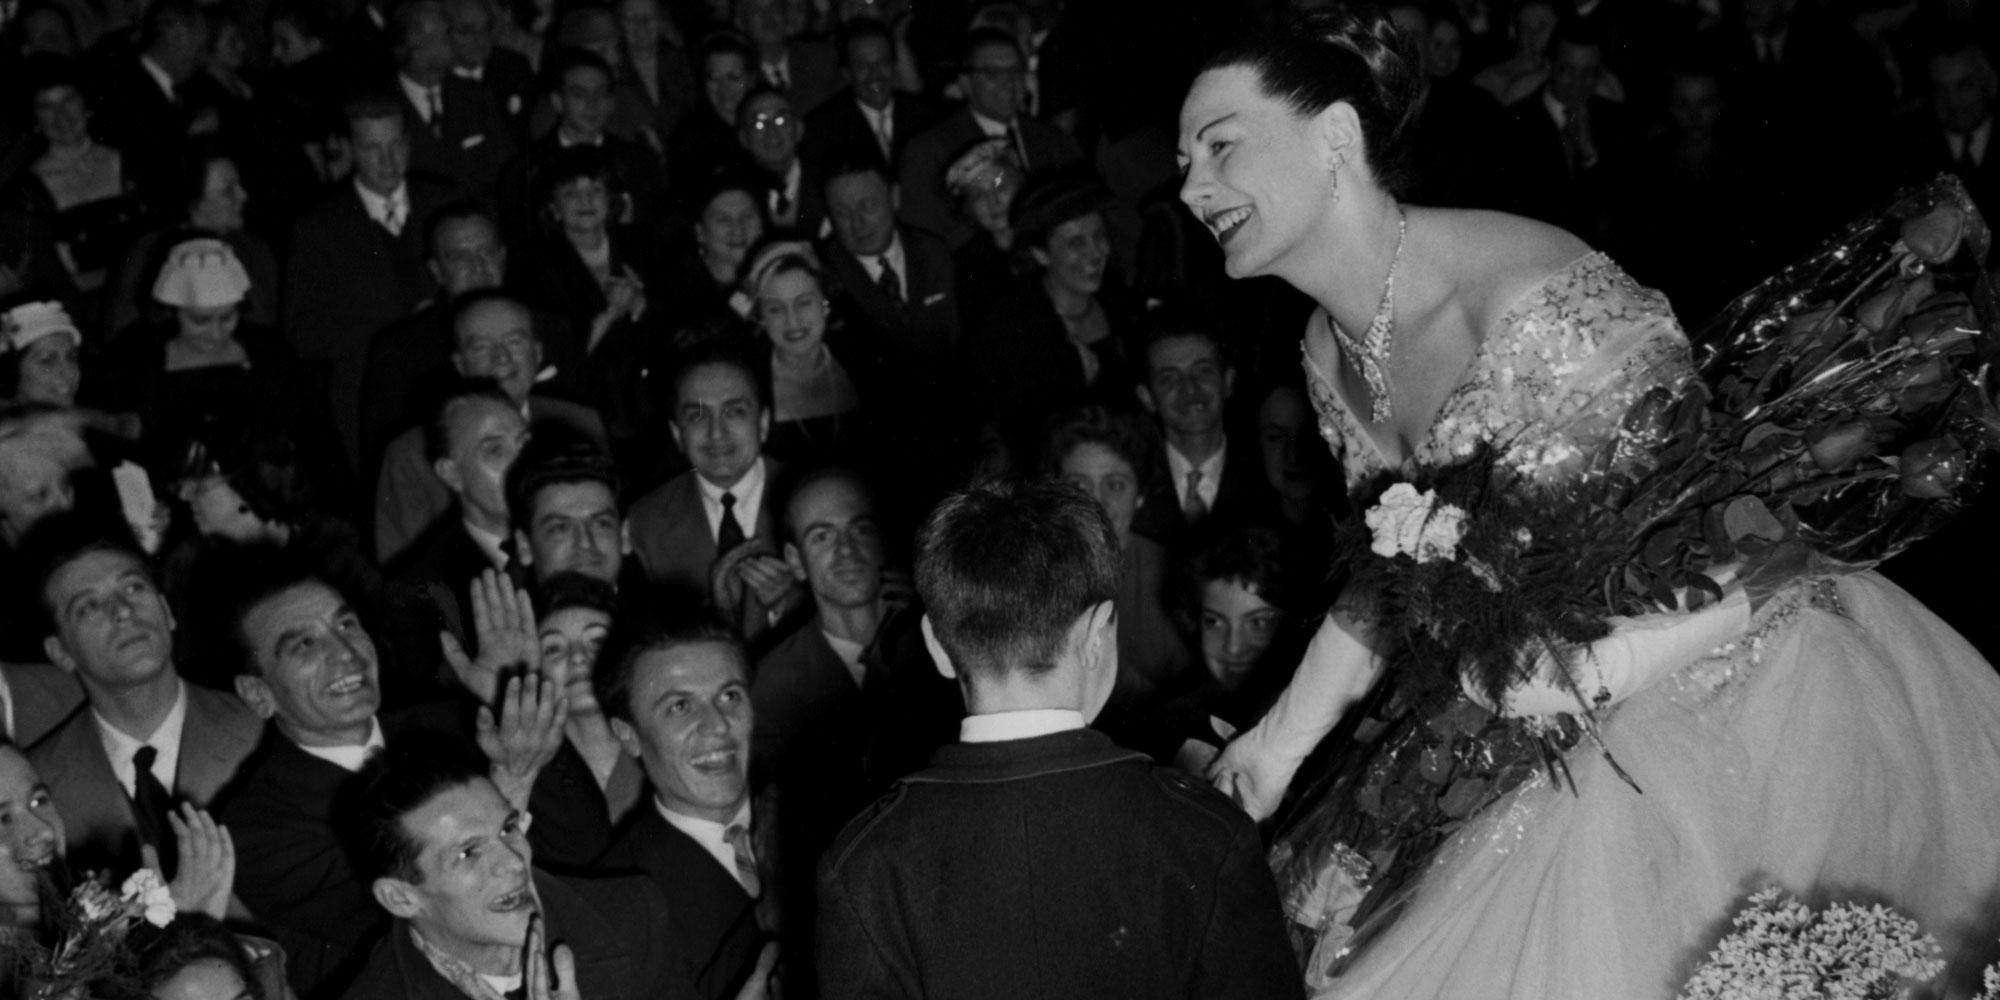 Renata Tebaldi, teatro Manzoni Milano, 1957